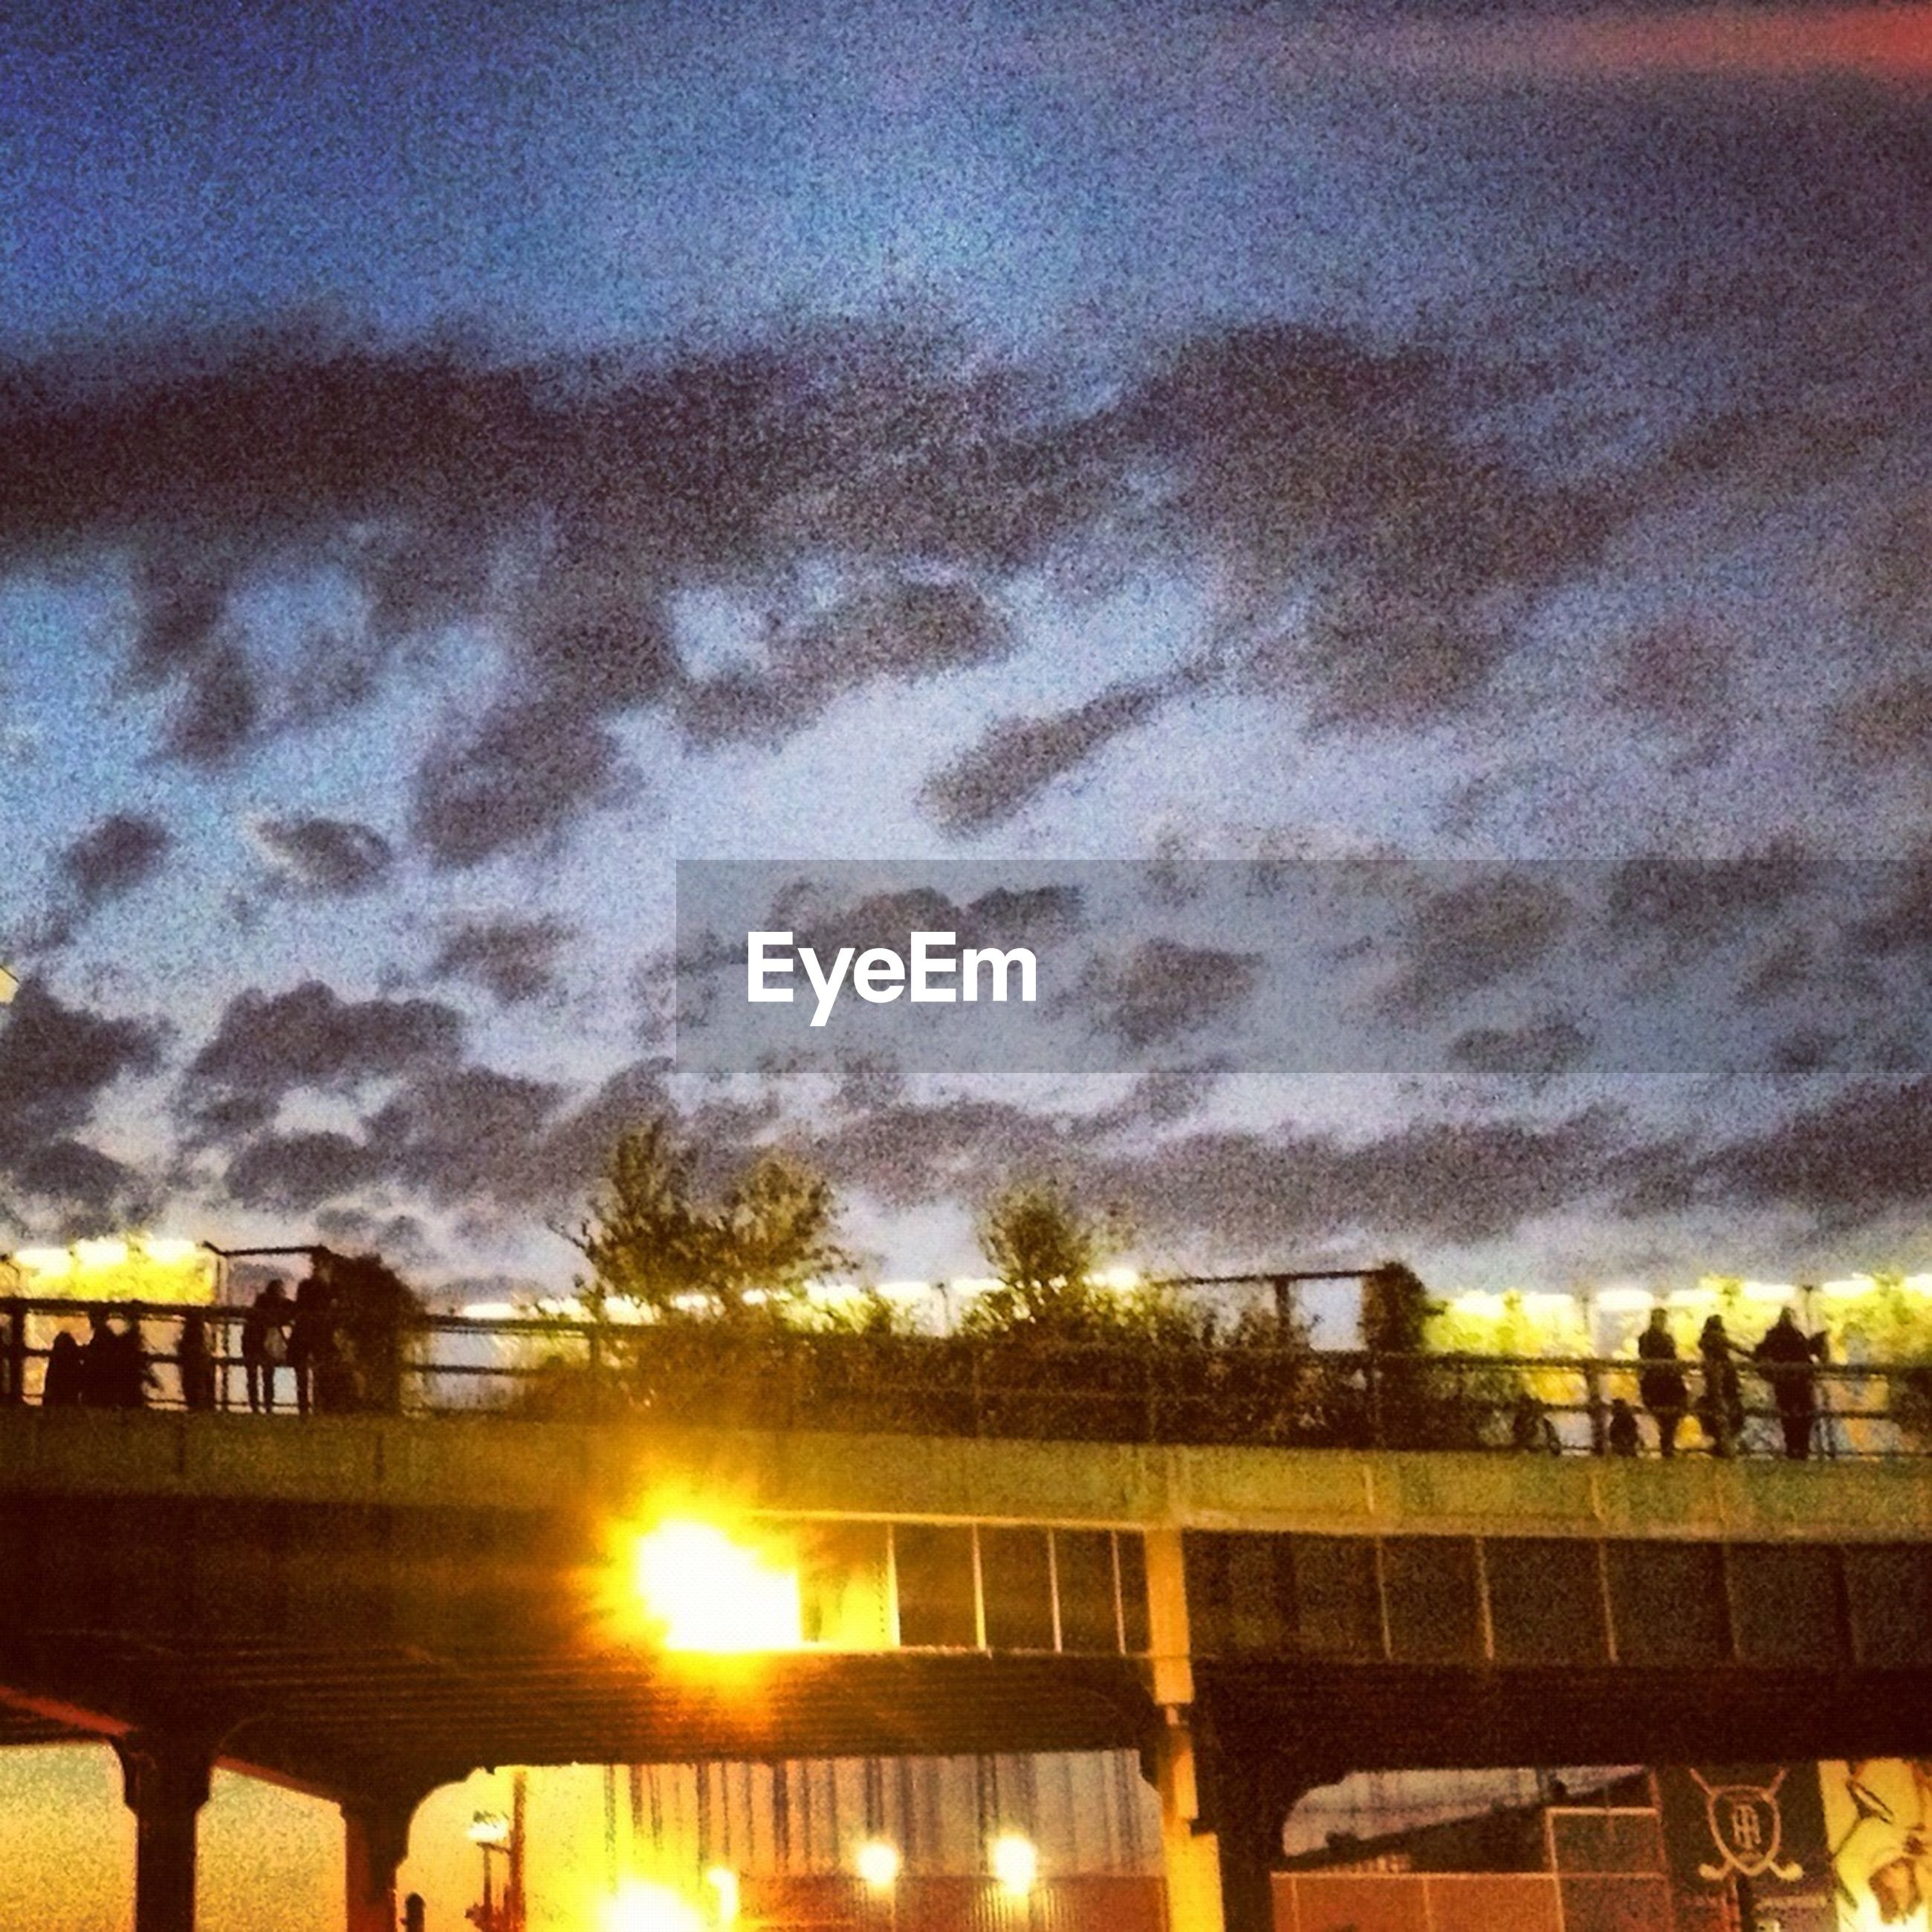 sky, sunset, water, cloud - sky, built structure, railing, architecture, men, lifestyles, nature, sea, silhouette, incidental people, leisure activity, beauty in nature, orange color, scenics, cloudy, cloud